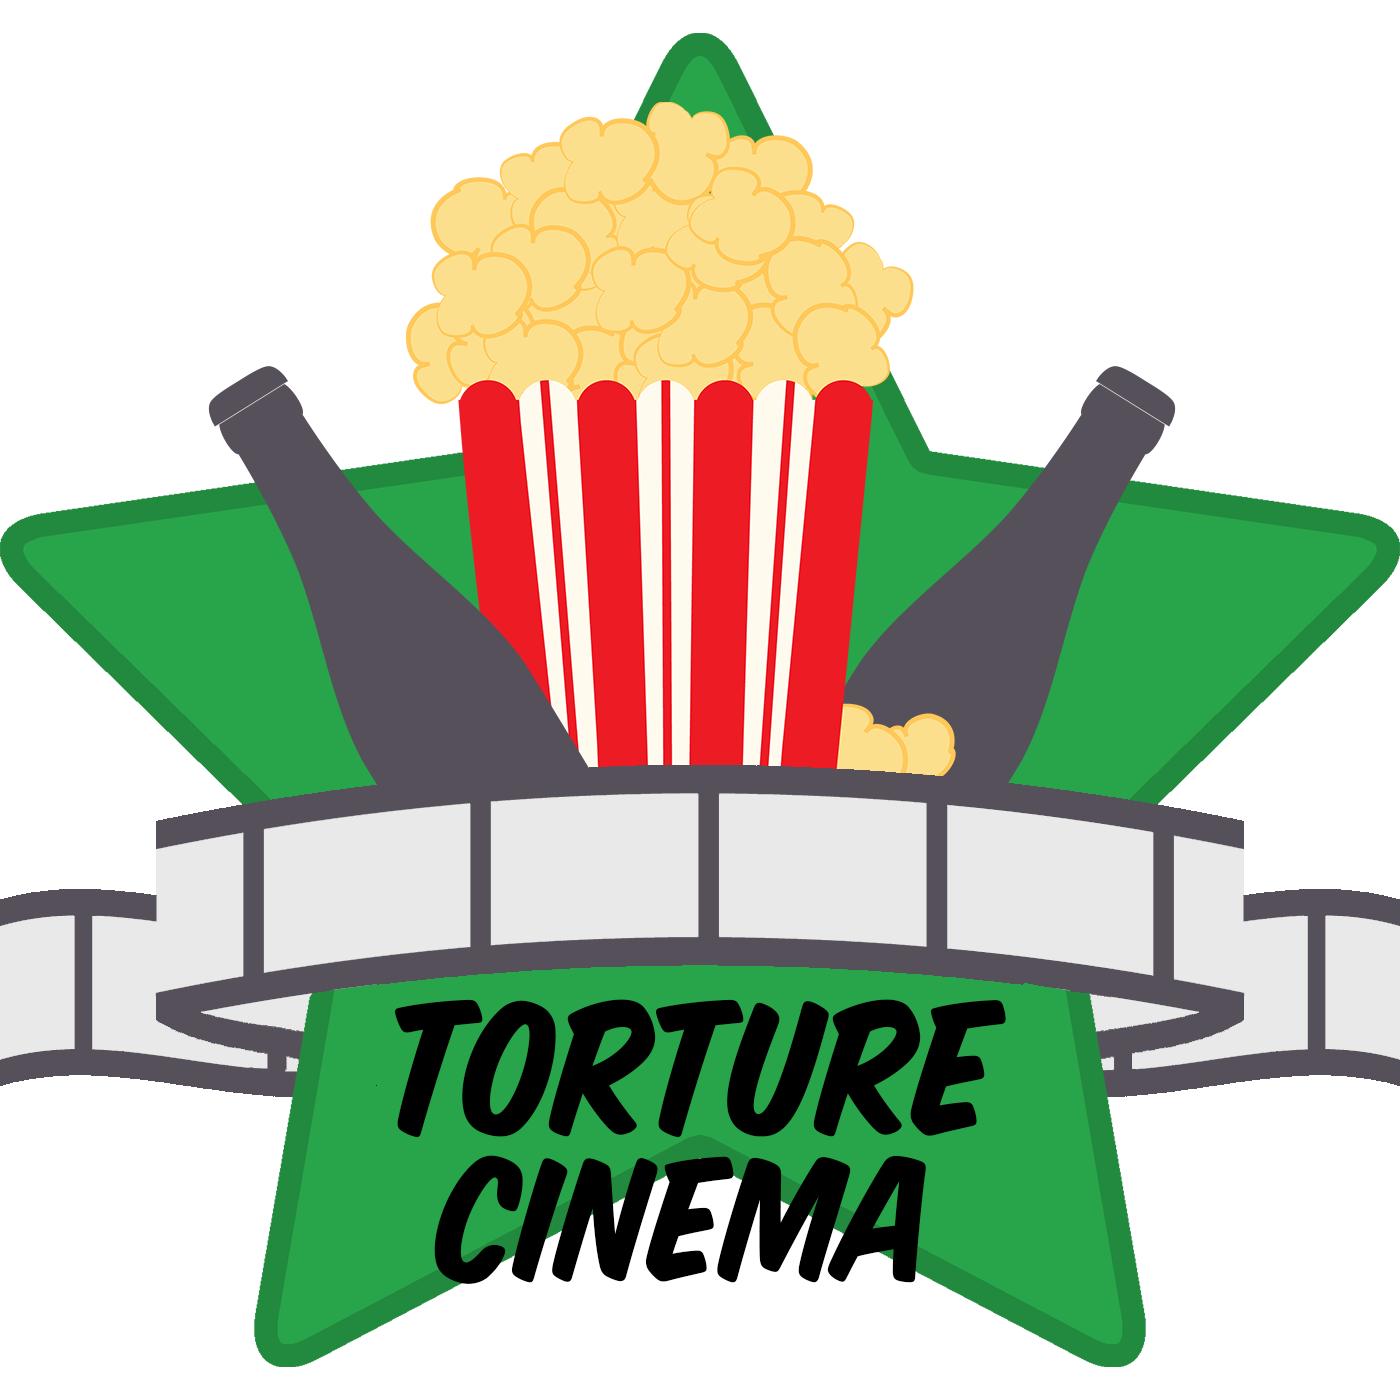 Torture Cinema